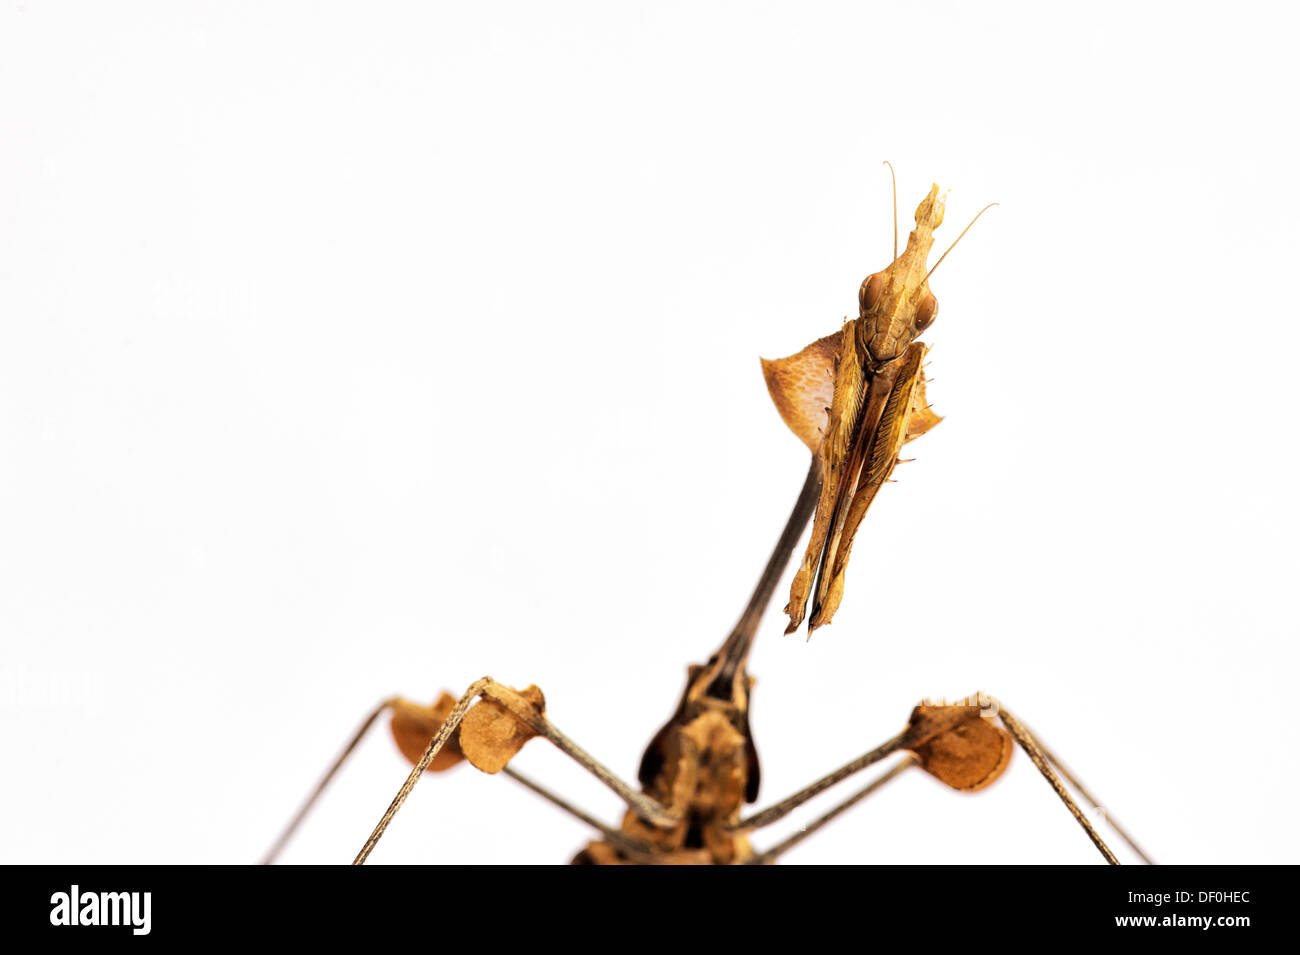 Gongylus gongyloides. Violín errante mantis. Mantis ornamentado. Indian Rose mantis Imagen De Stock